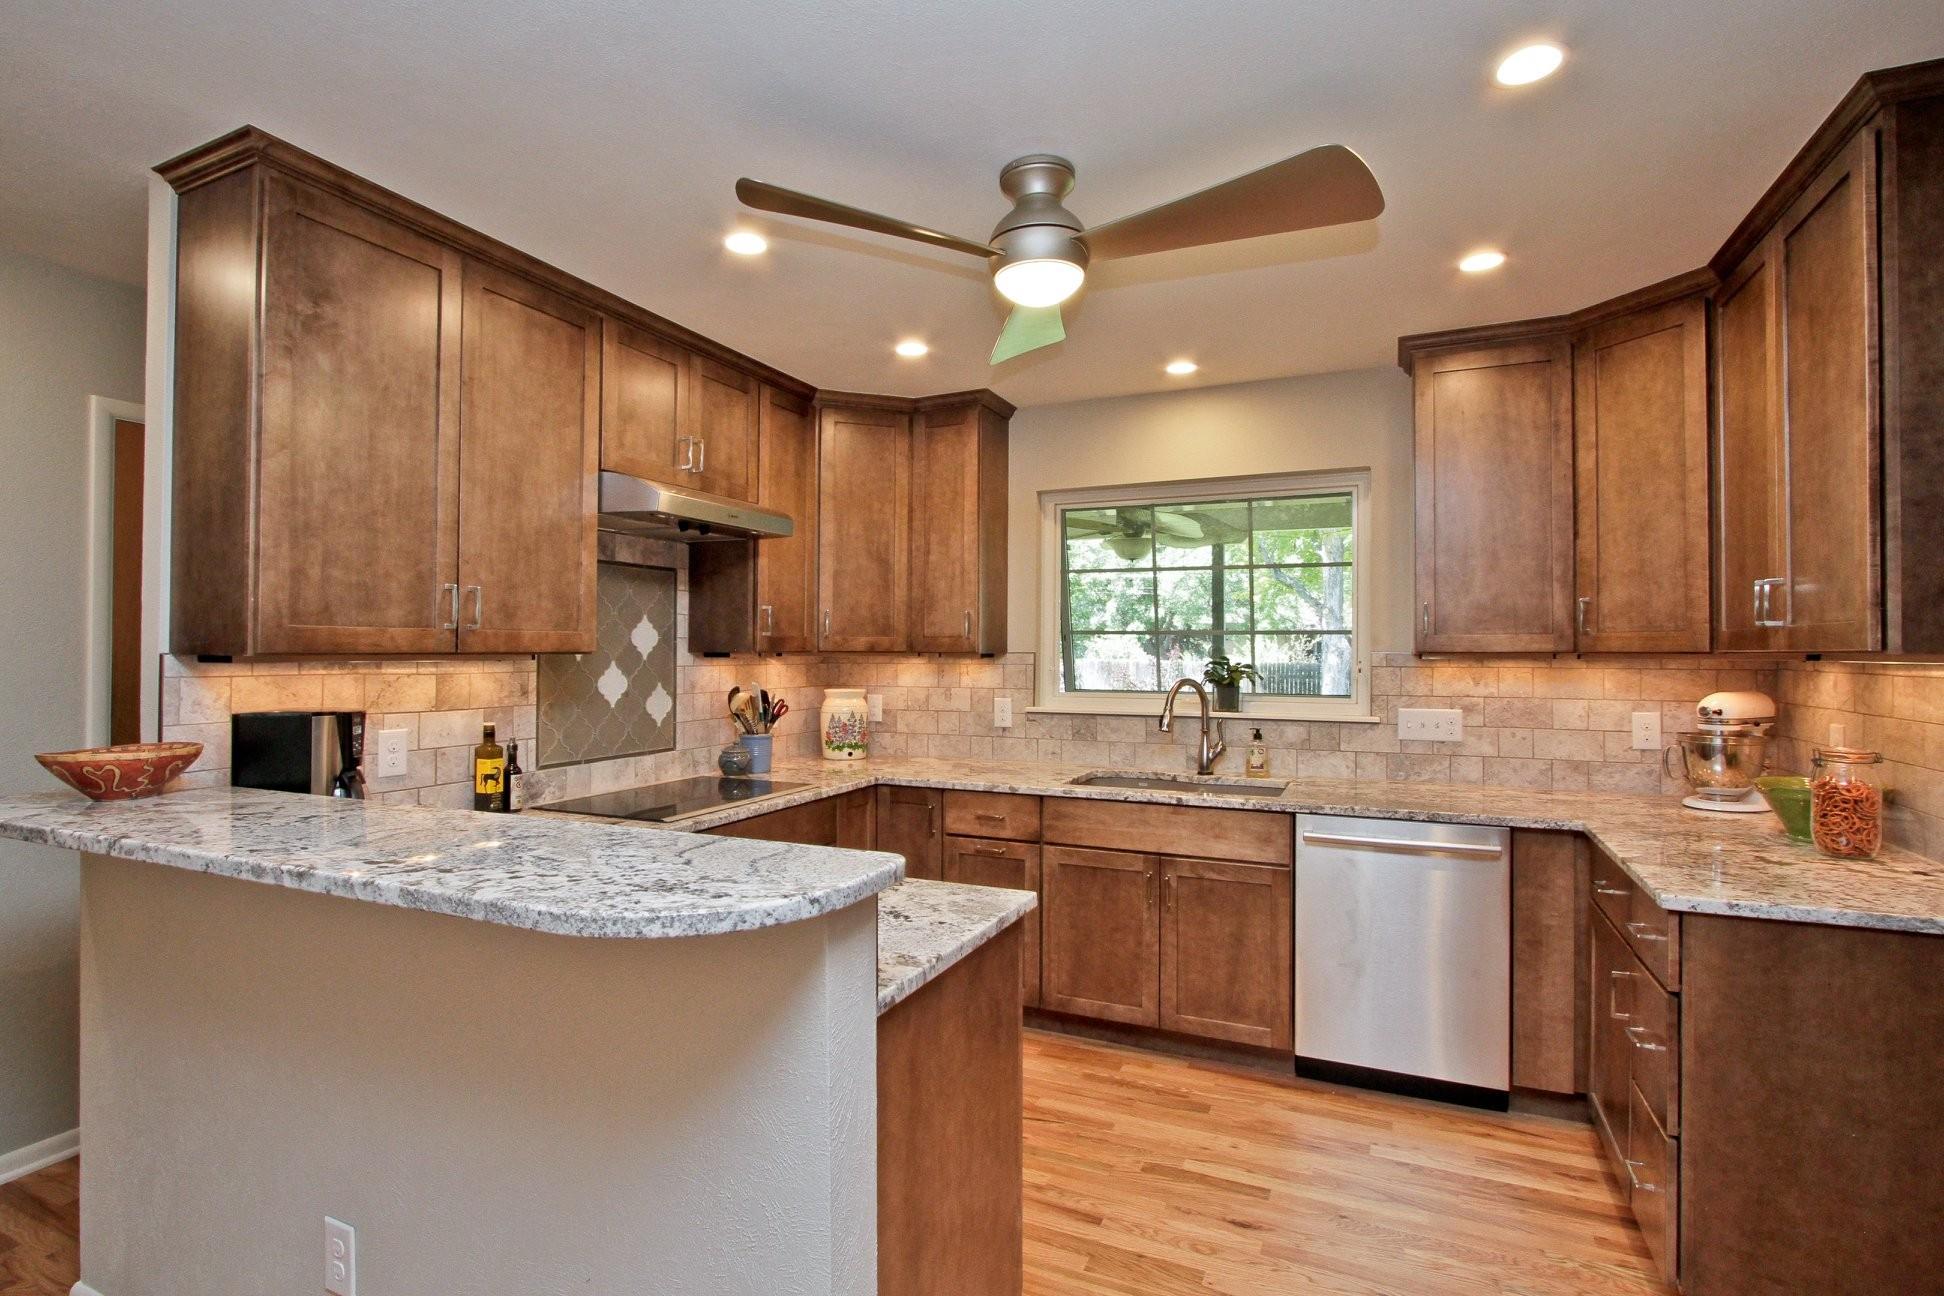 Cress Kitchen & Bath | LinkedIn